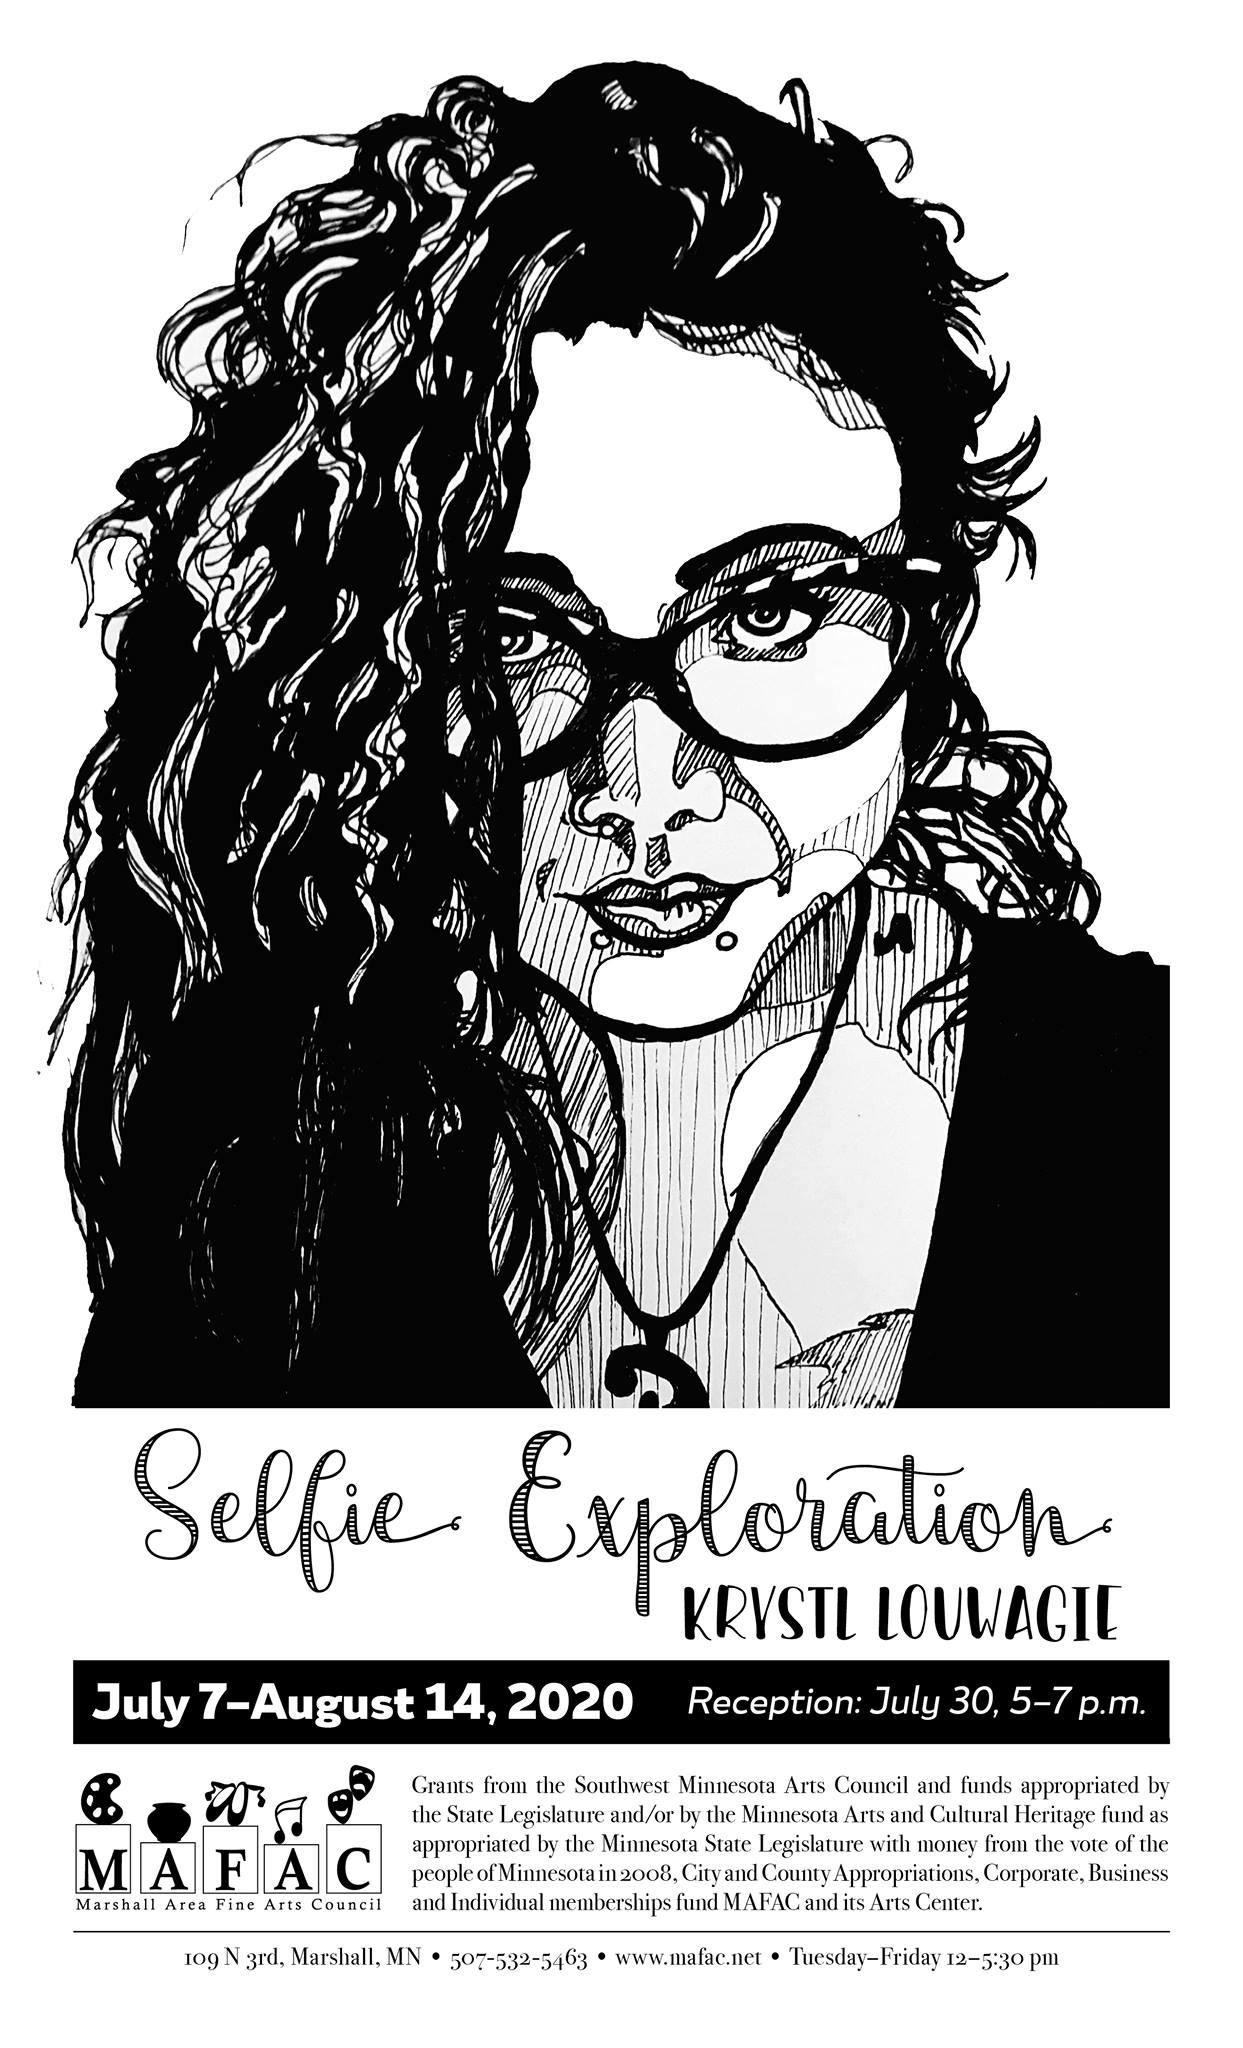 Self portrait done in sharpie marker.